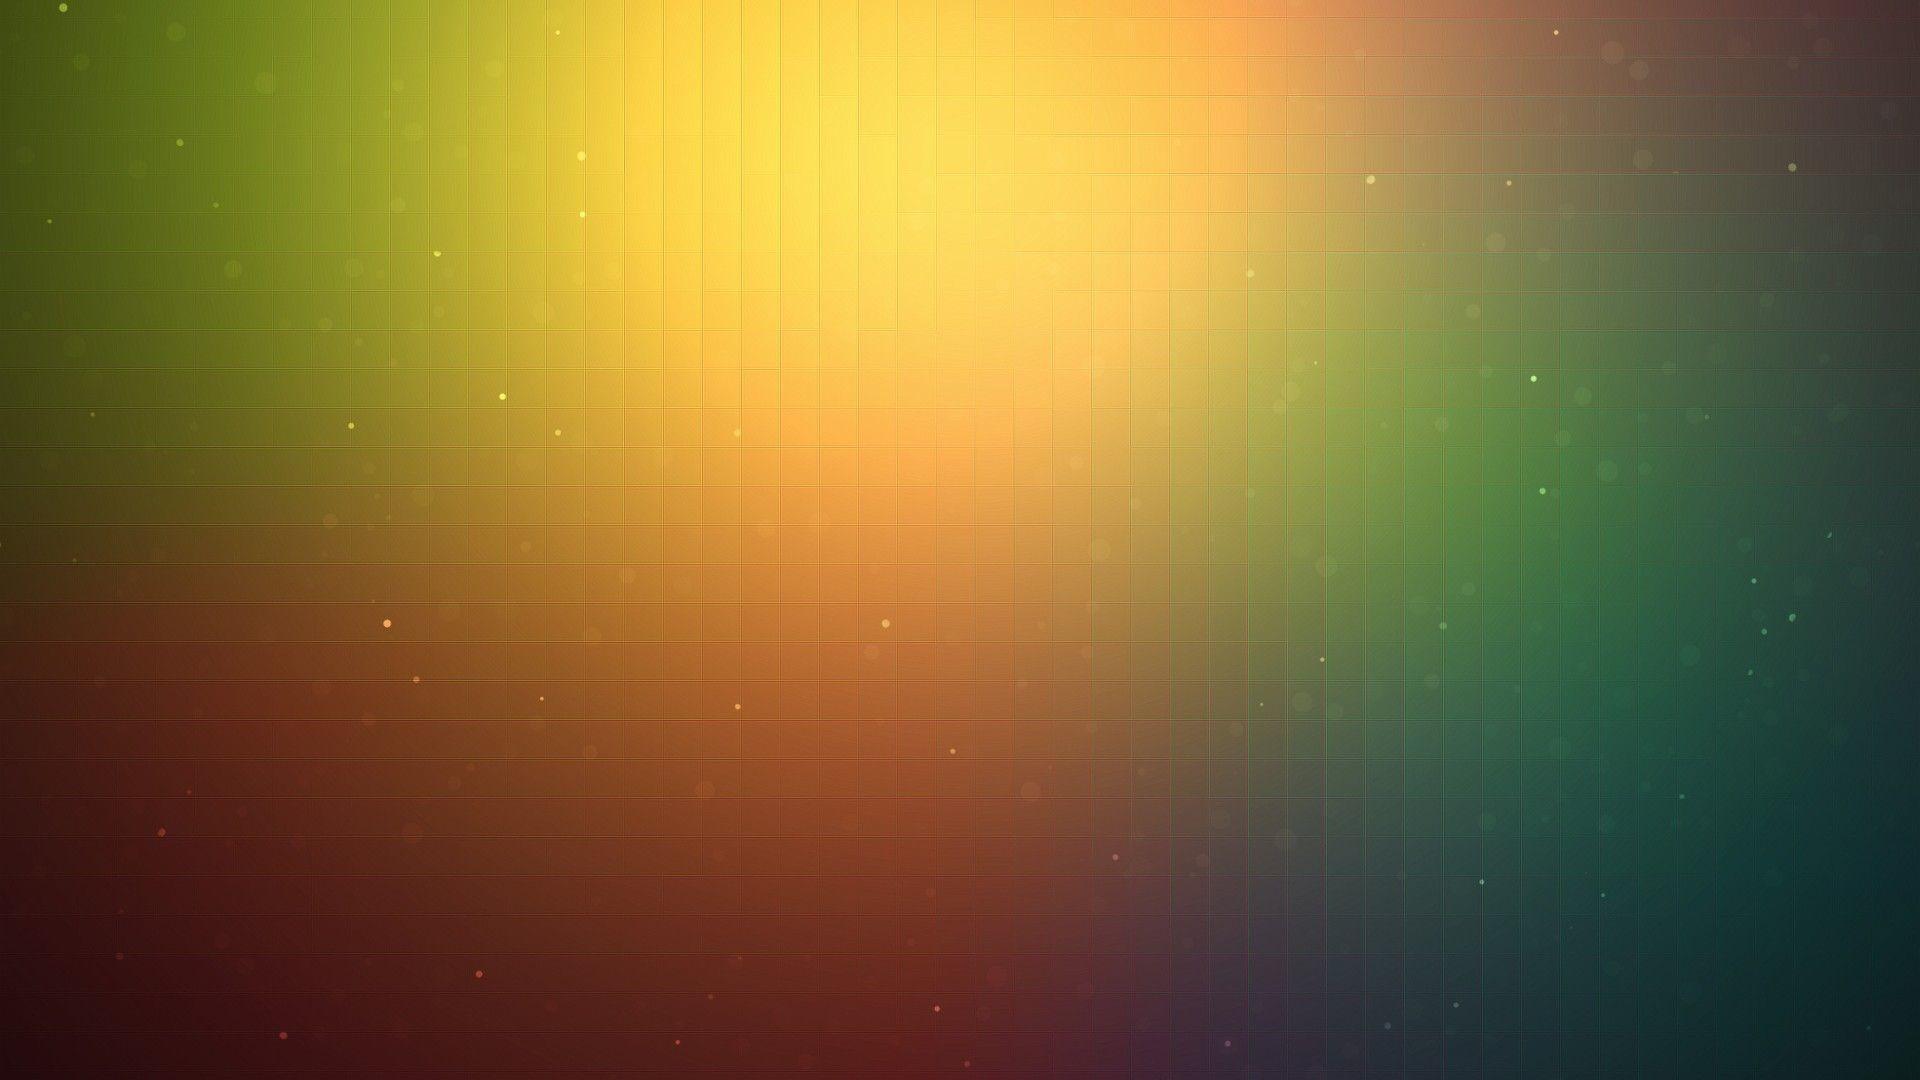 Fantastic-Plain-Wallpaper-Orange-Image-Lines-Picture.jpg